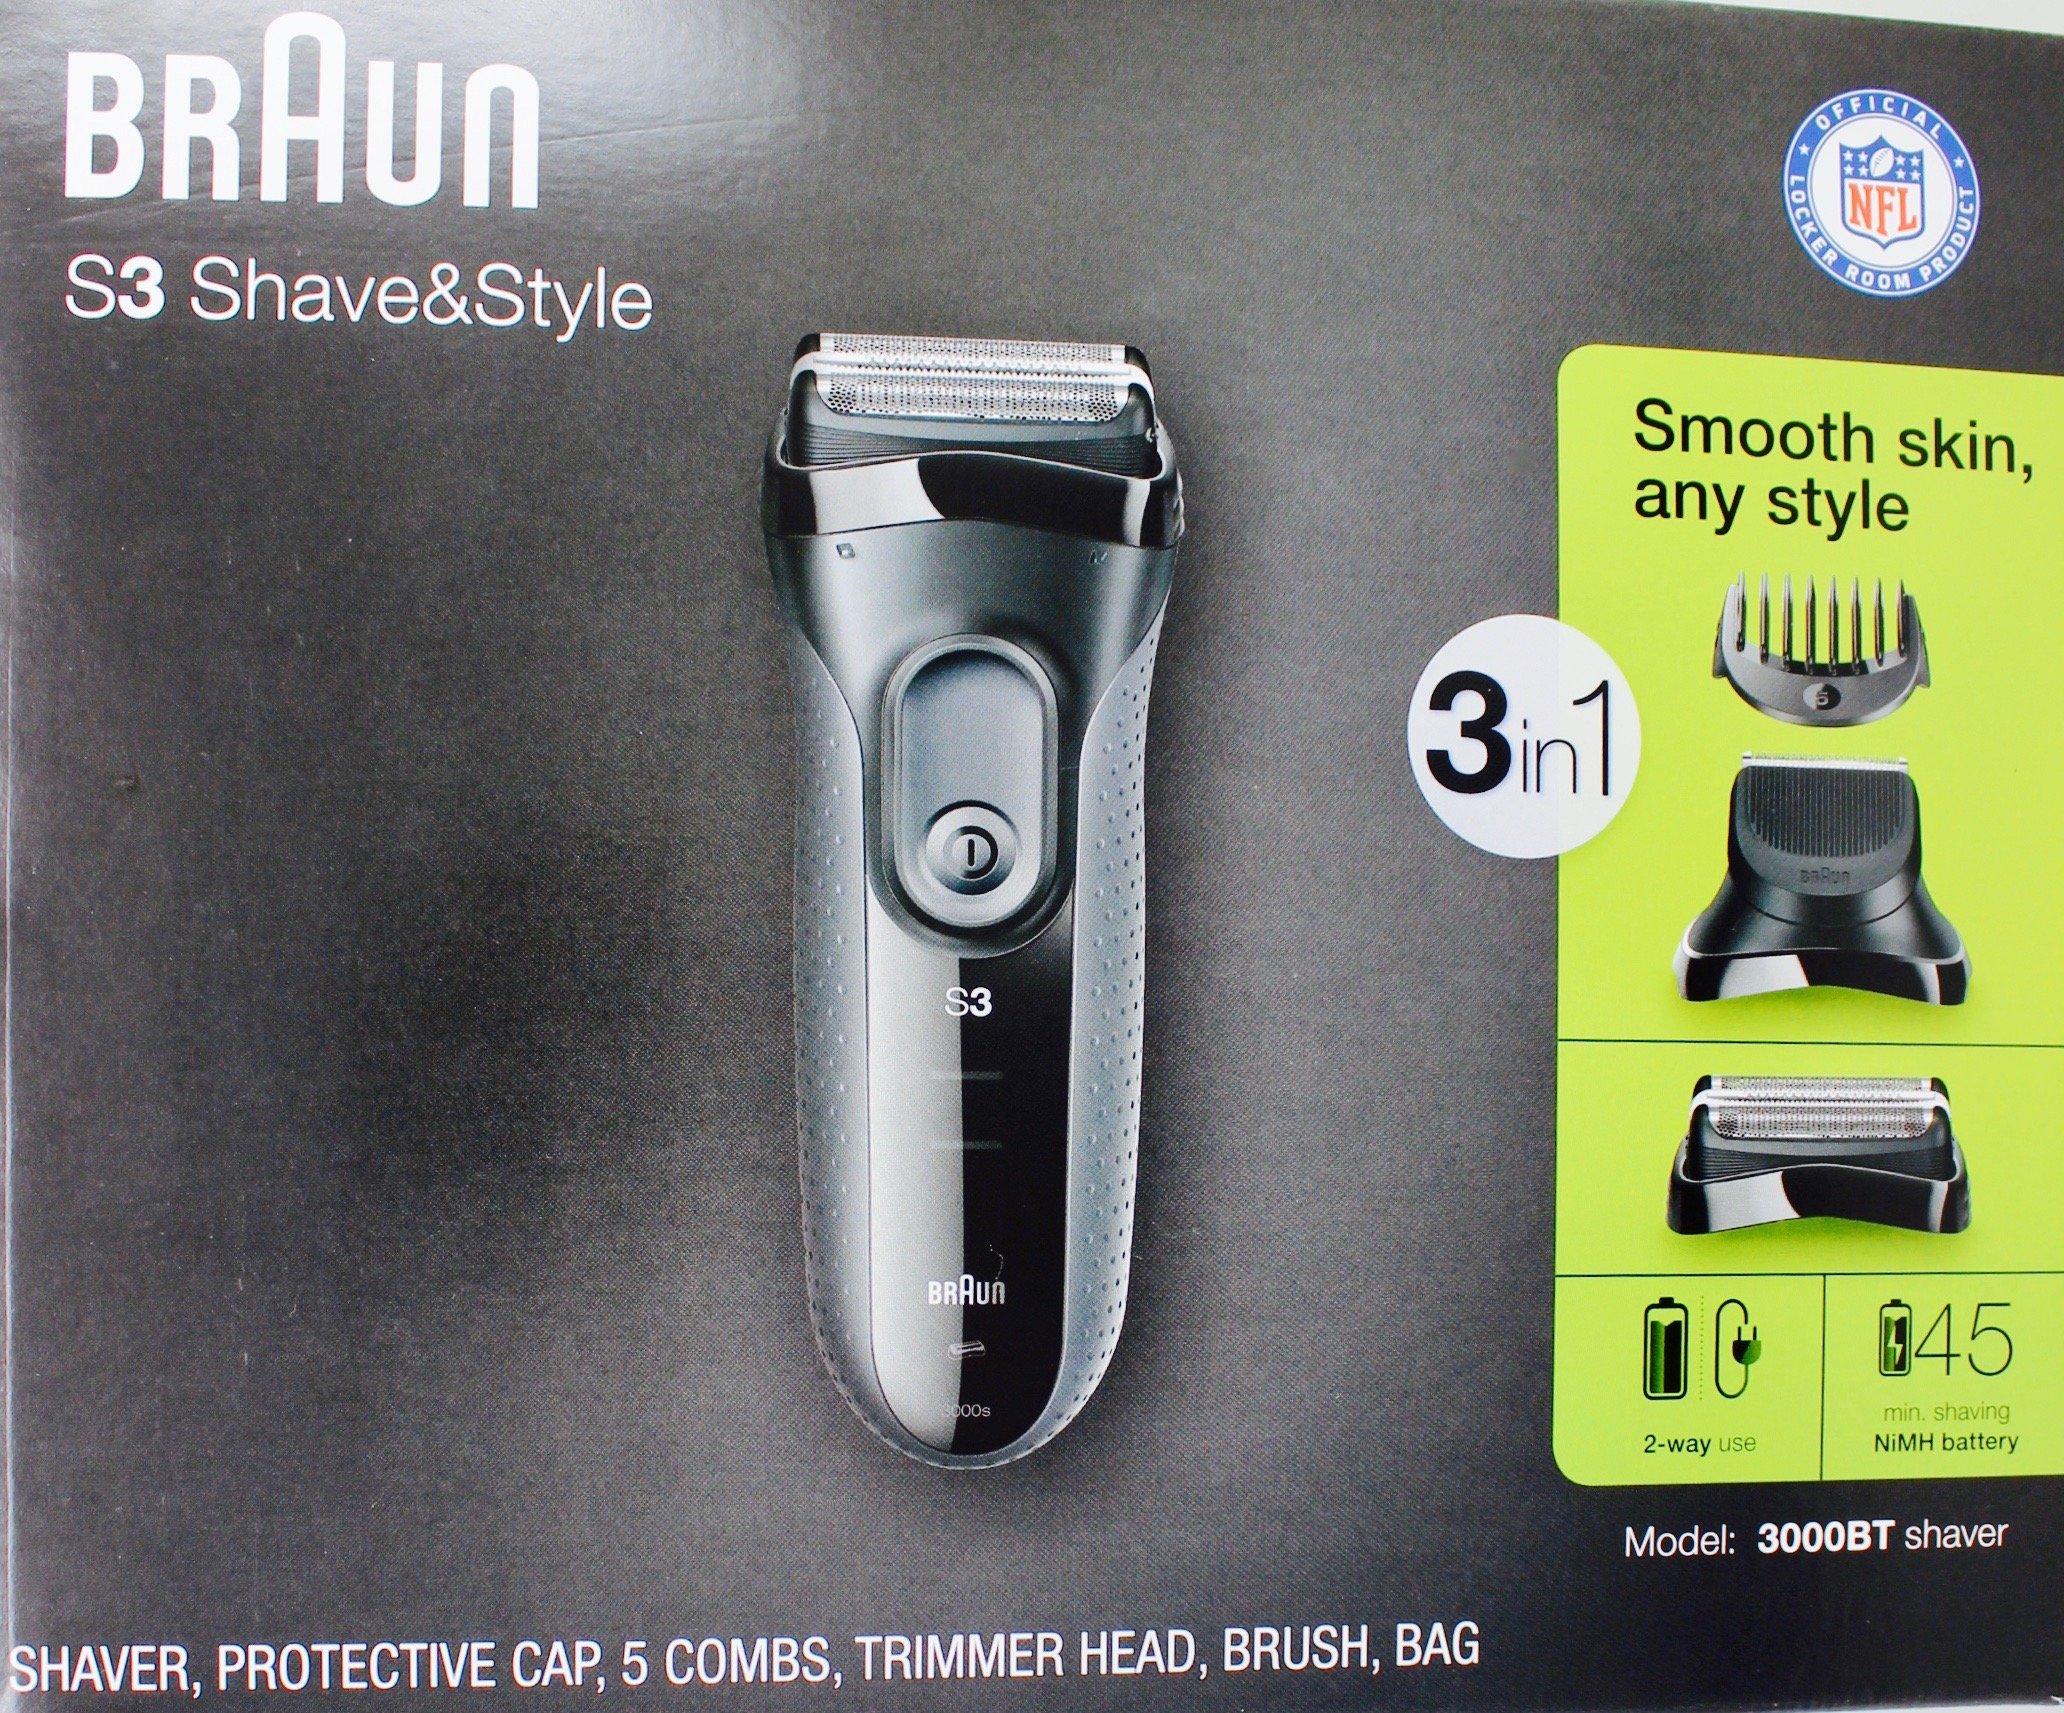 Braun 3-in-1 Shaver S3, Model 3000BT